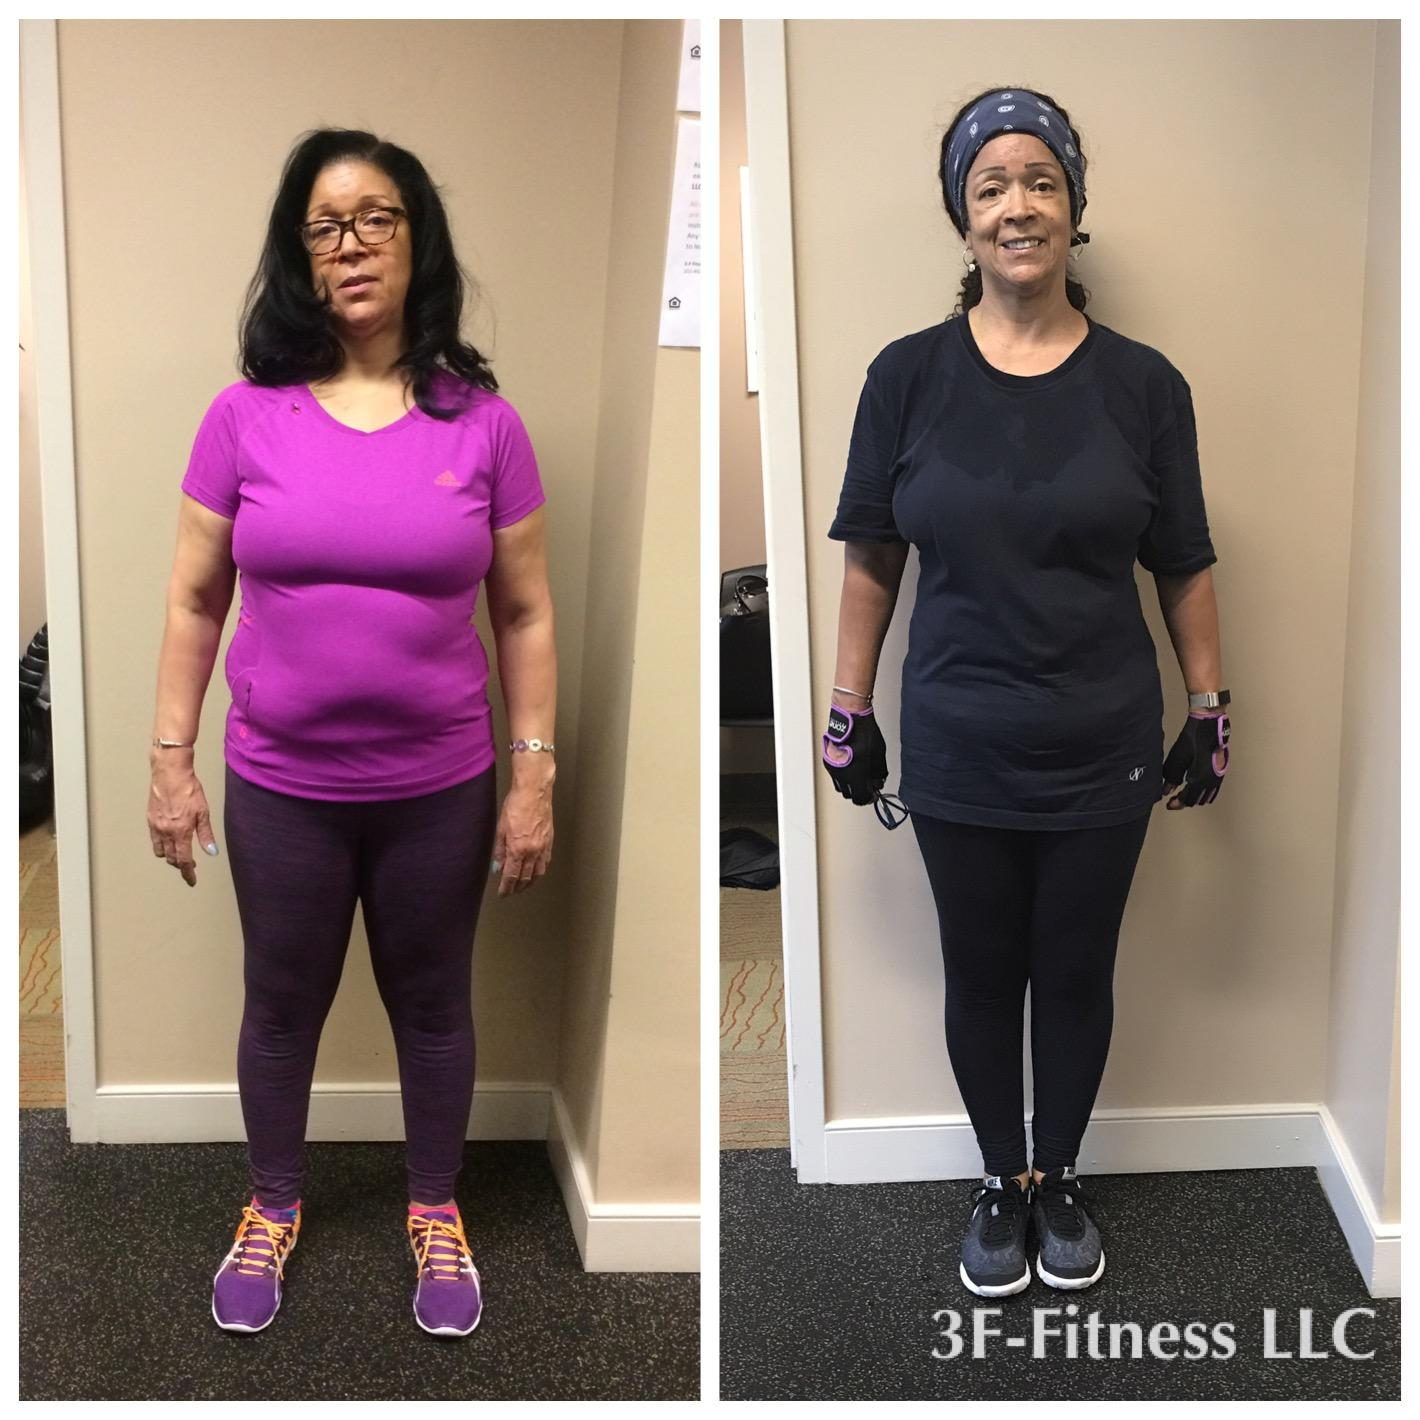 3F-Fitness LLC image 7